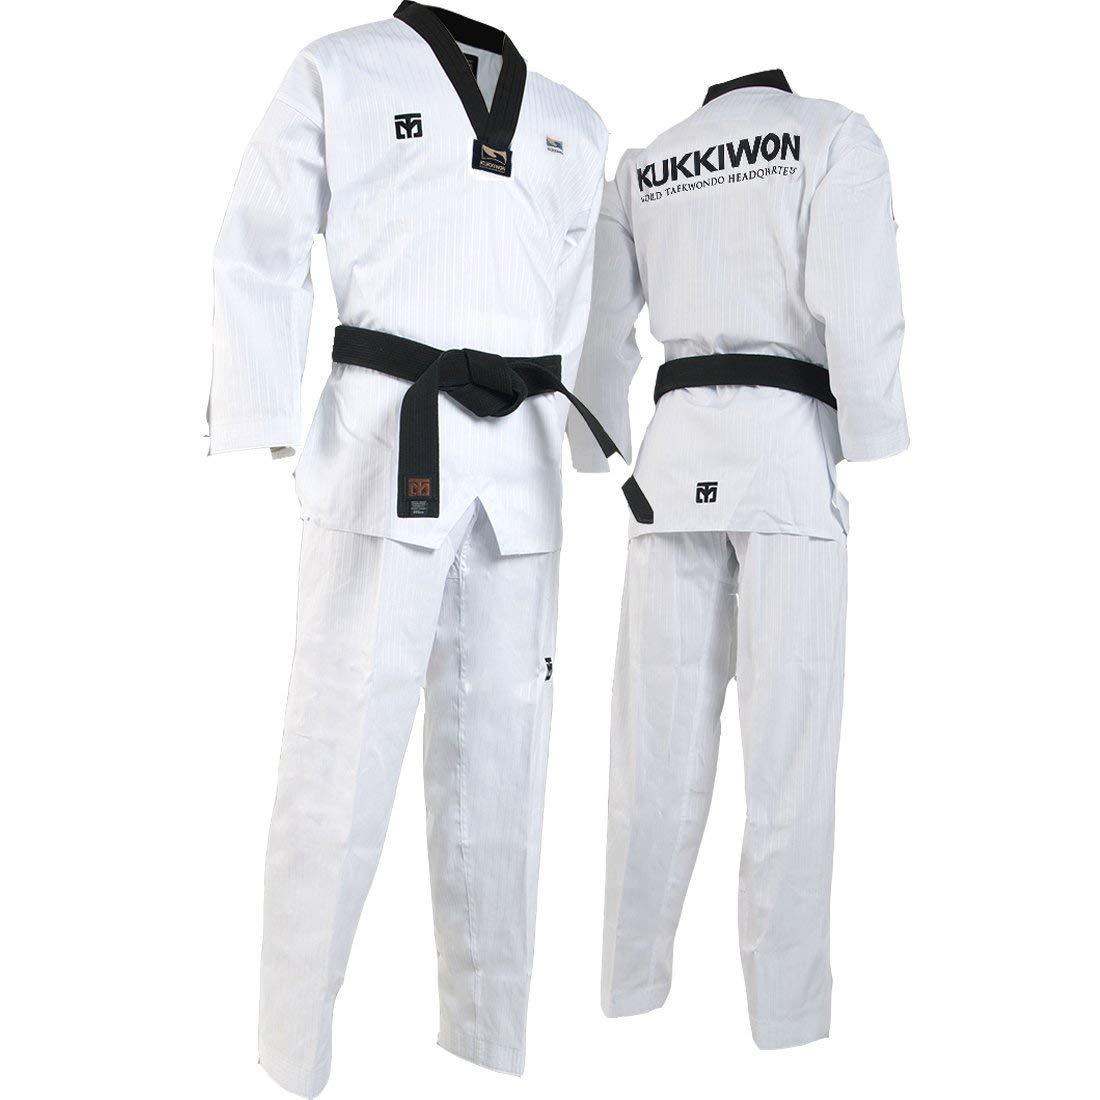 Mooto Uniforme uniforme taekwondo kukkiwon tae kwon do dobok mondo coreano